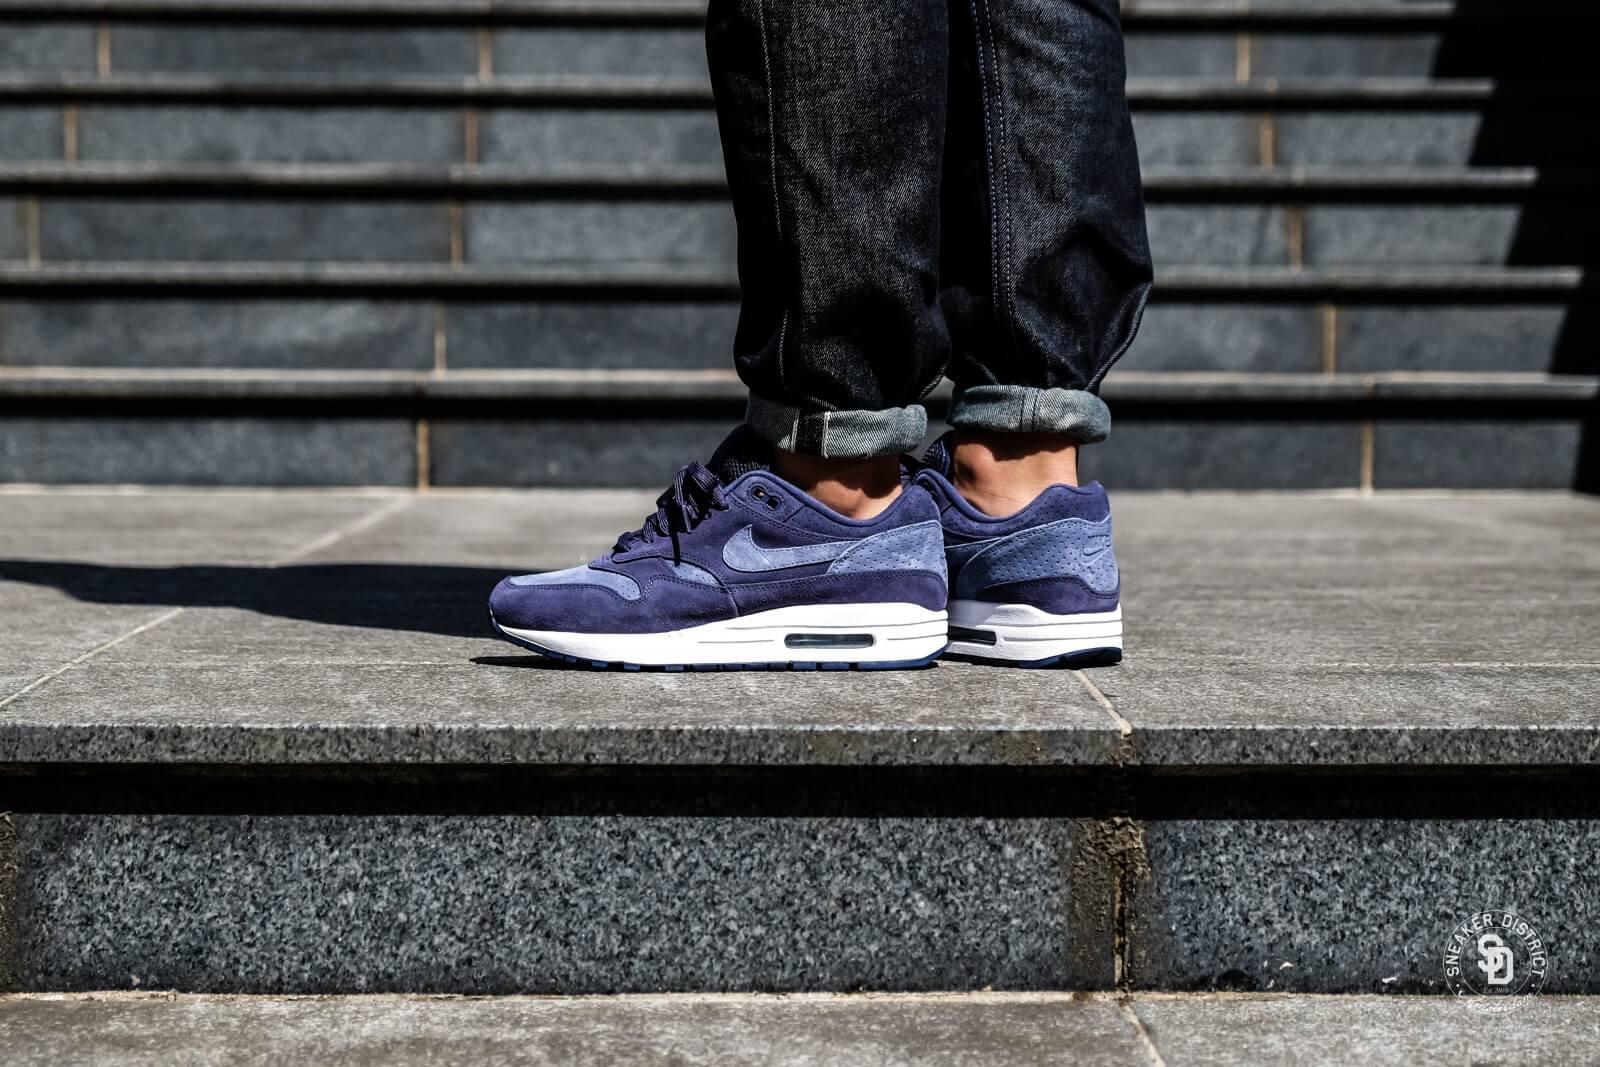 Nike Air Max 1 Premium Mens Neutral IndigoDiffused Blue